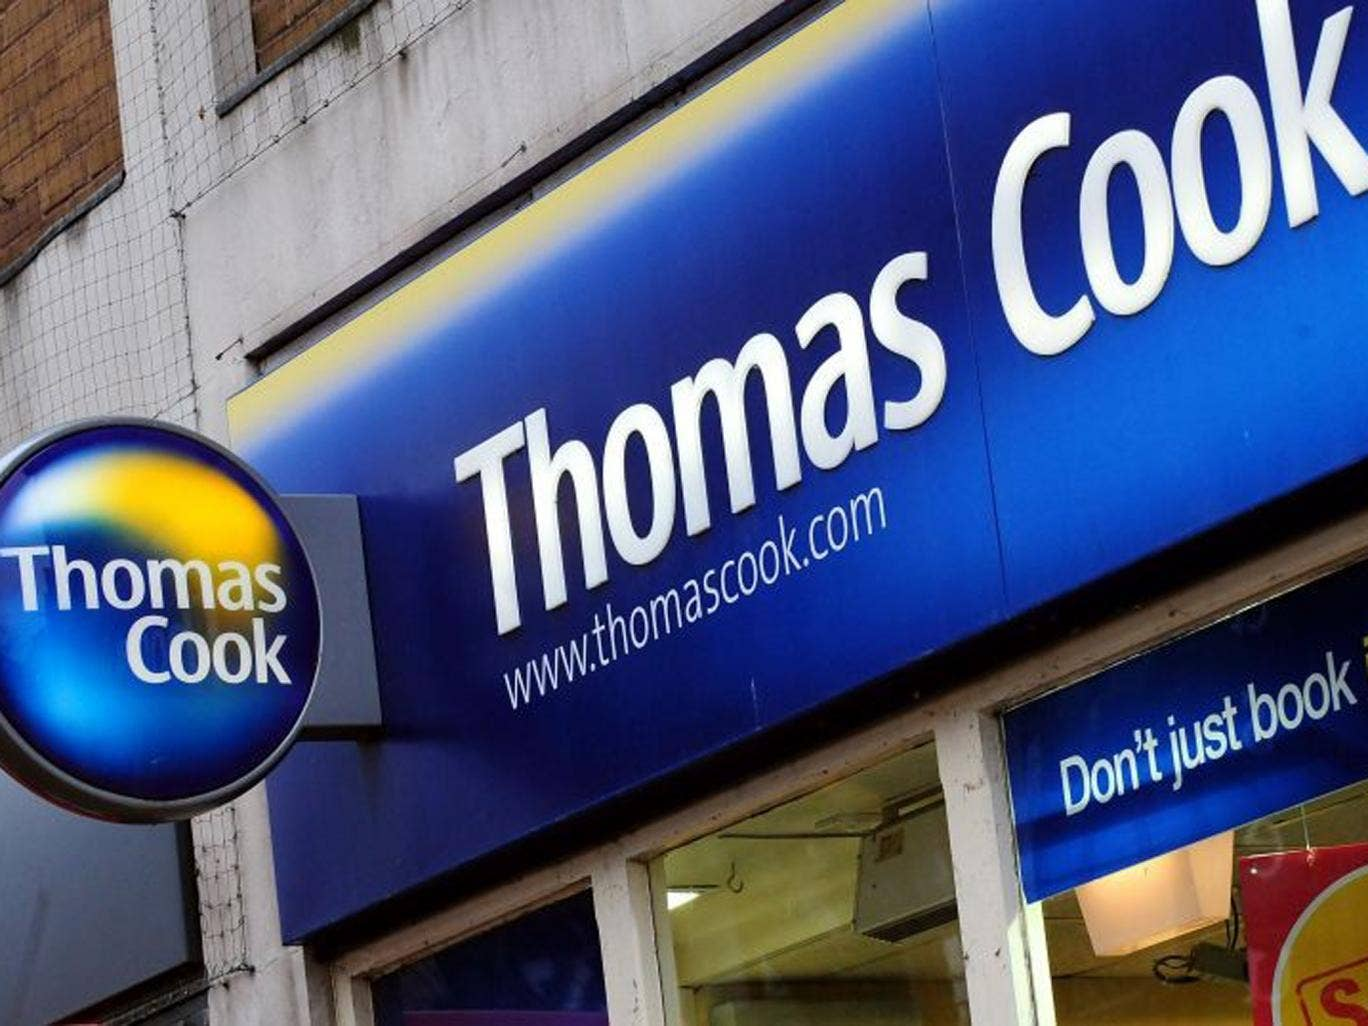 Thomas Cook announced plans to axe 2,500 UK jobs